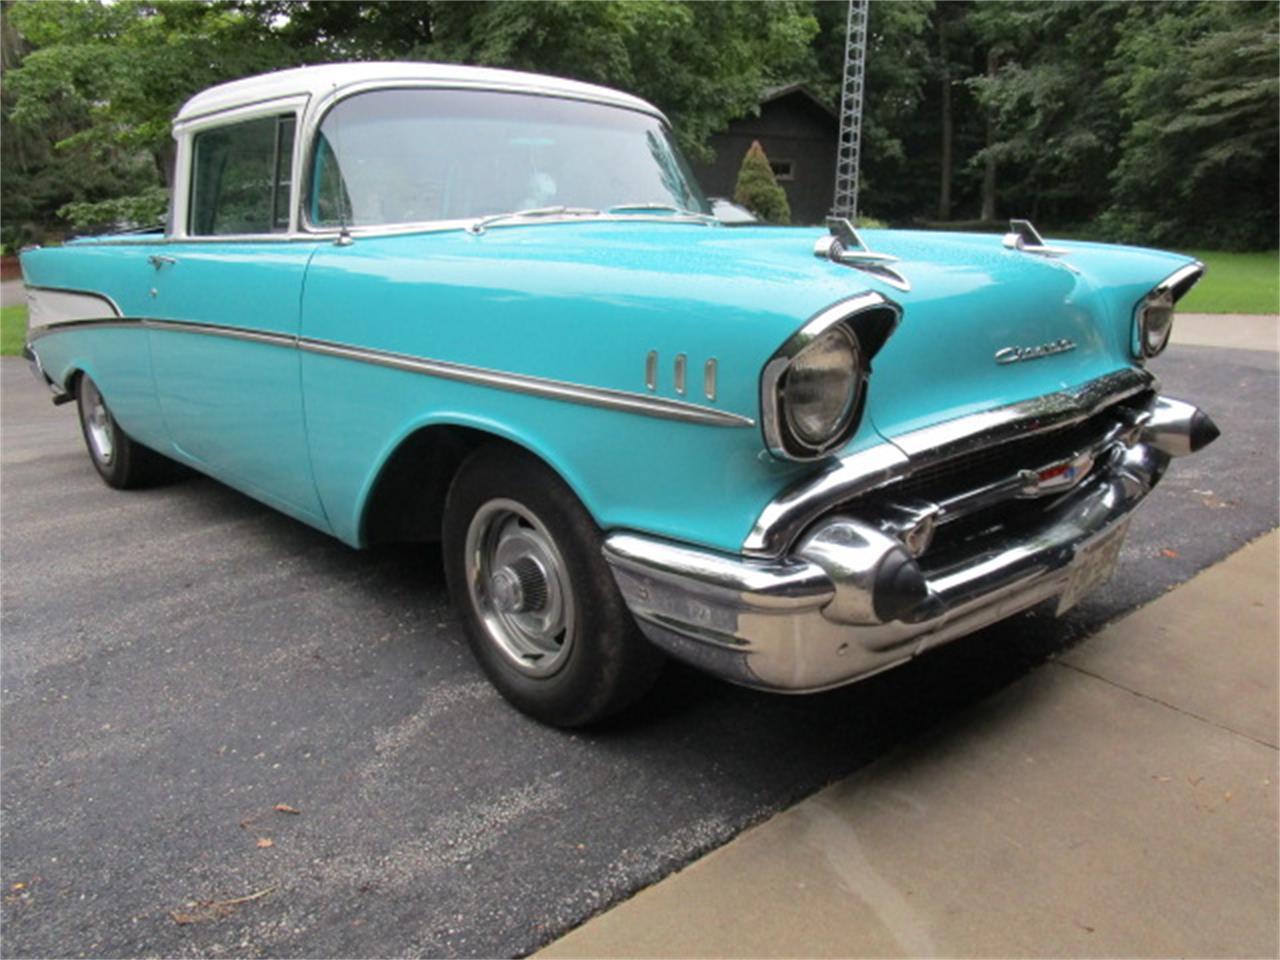 1957 Chevrolet El Camino (CC-1249305) for sale in Dodge Center, Minnesota